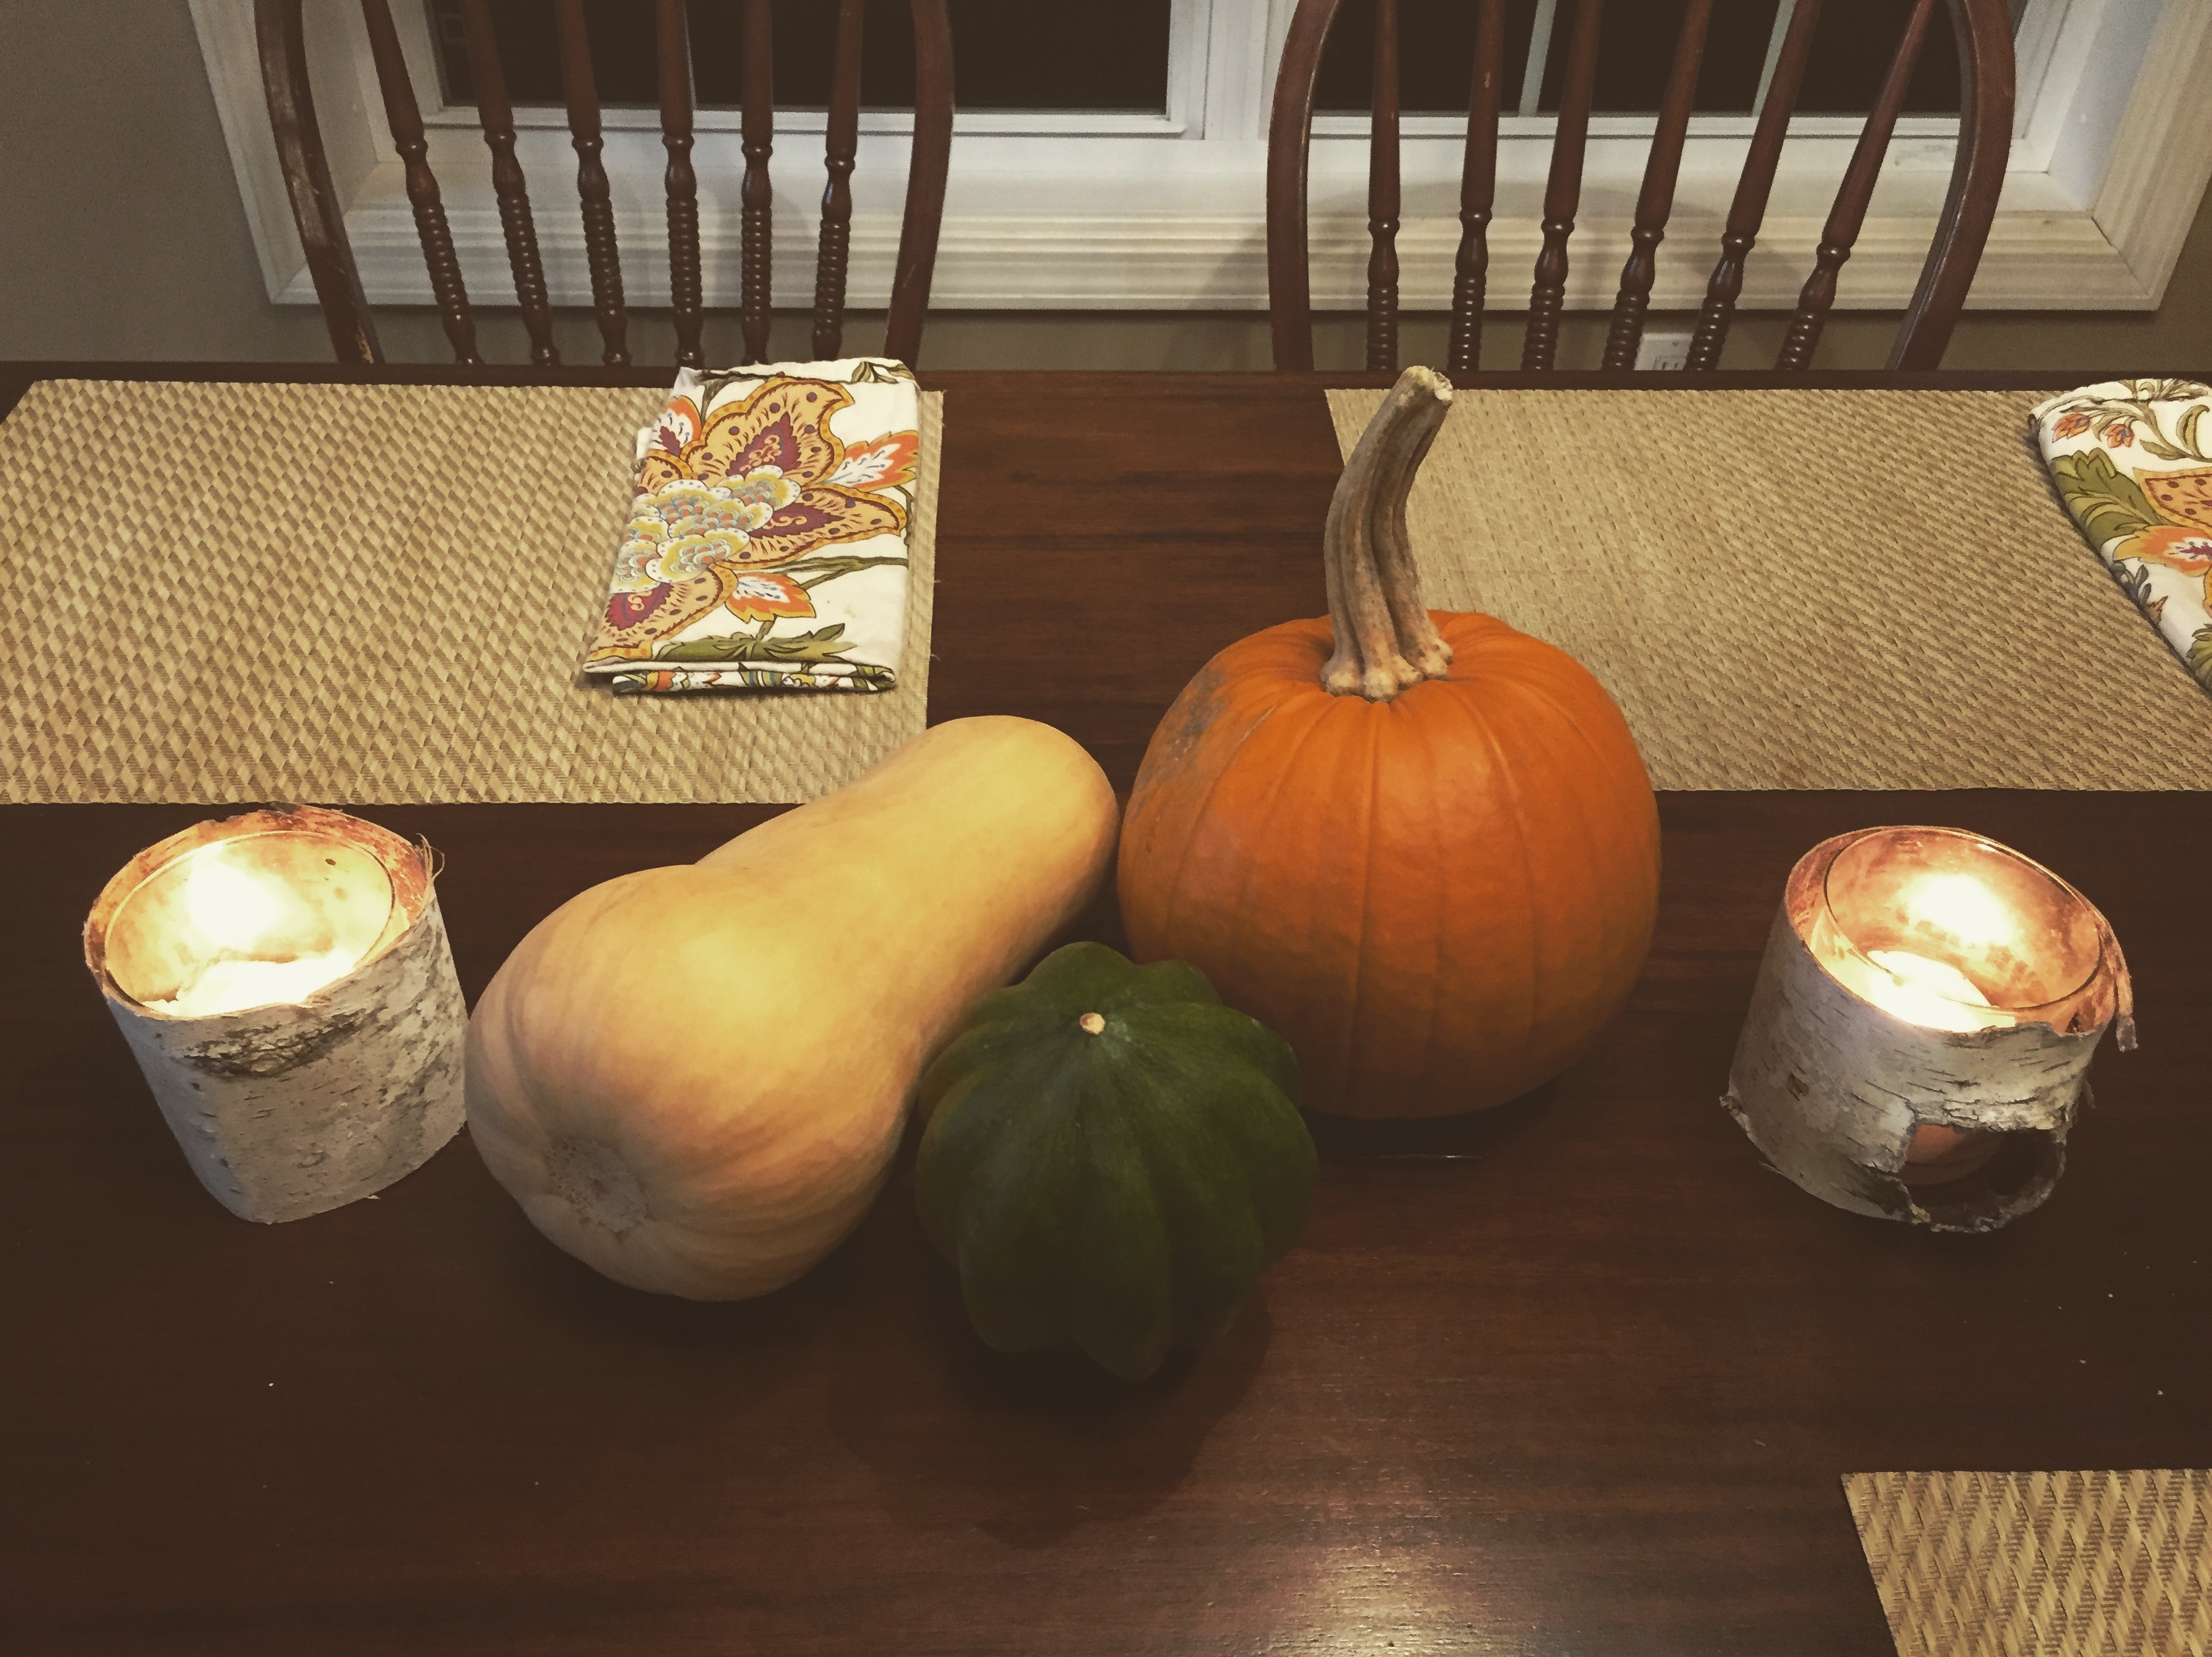 Frugal decorating pumpkin www.thethreeyearexperiment.com